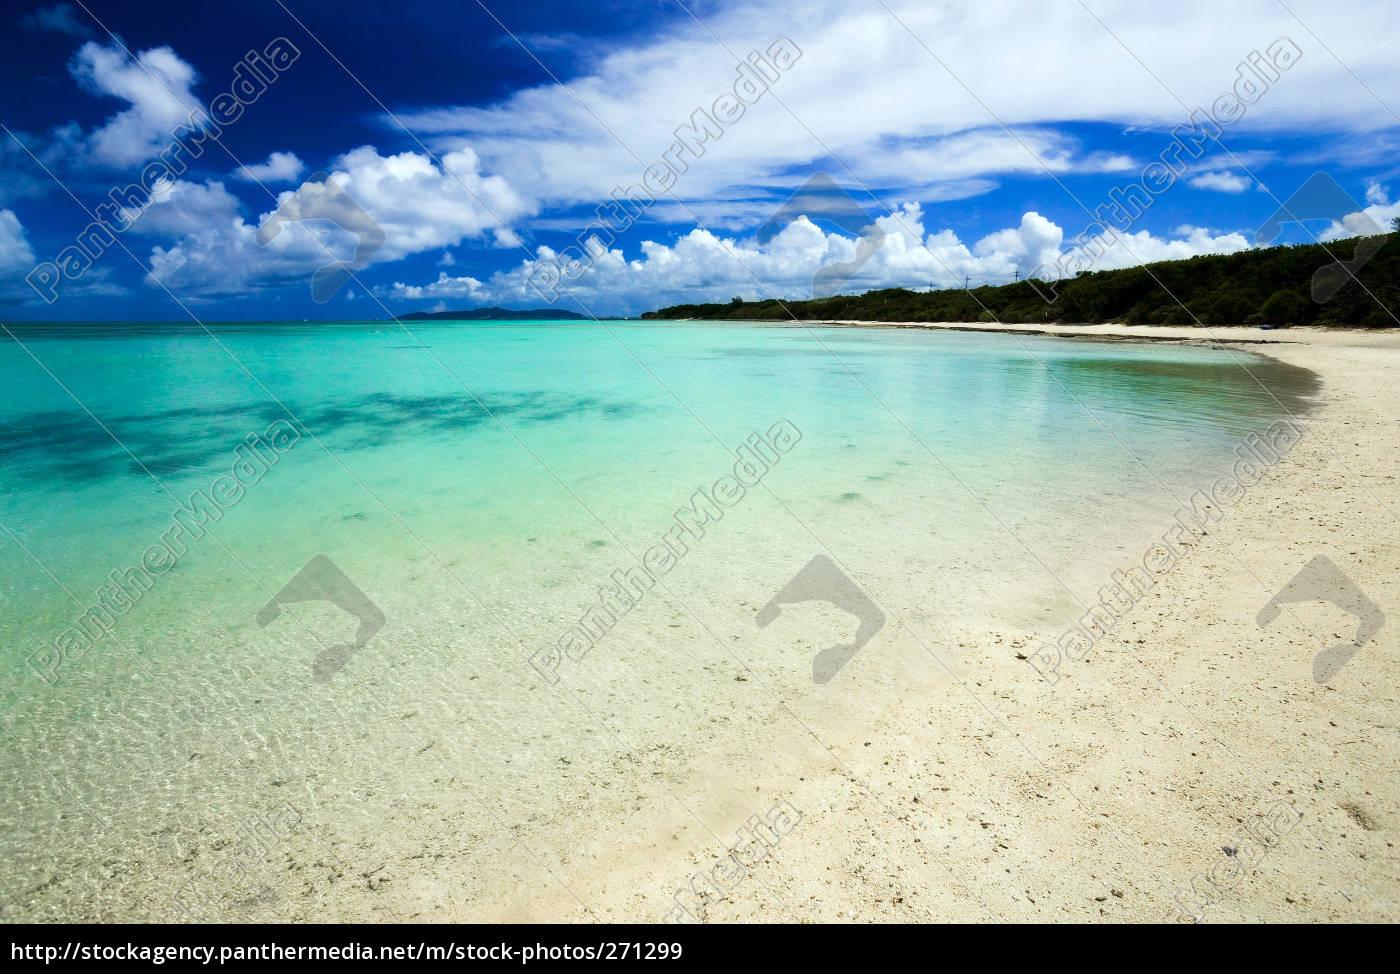 alone, at, the, beach, ii - 271299